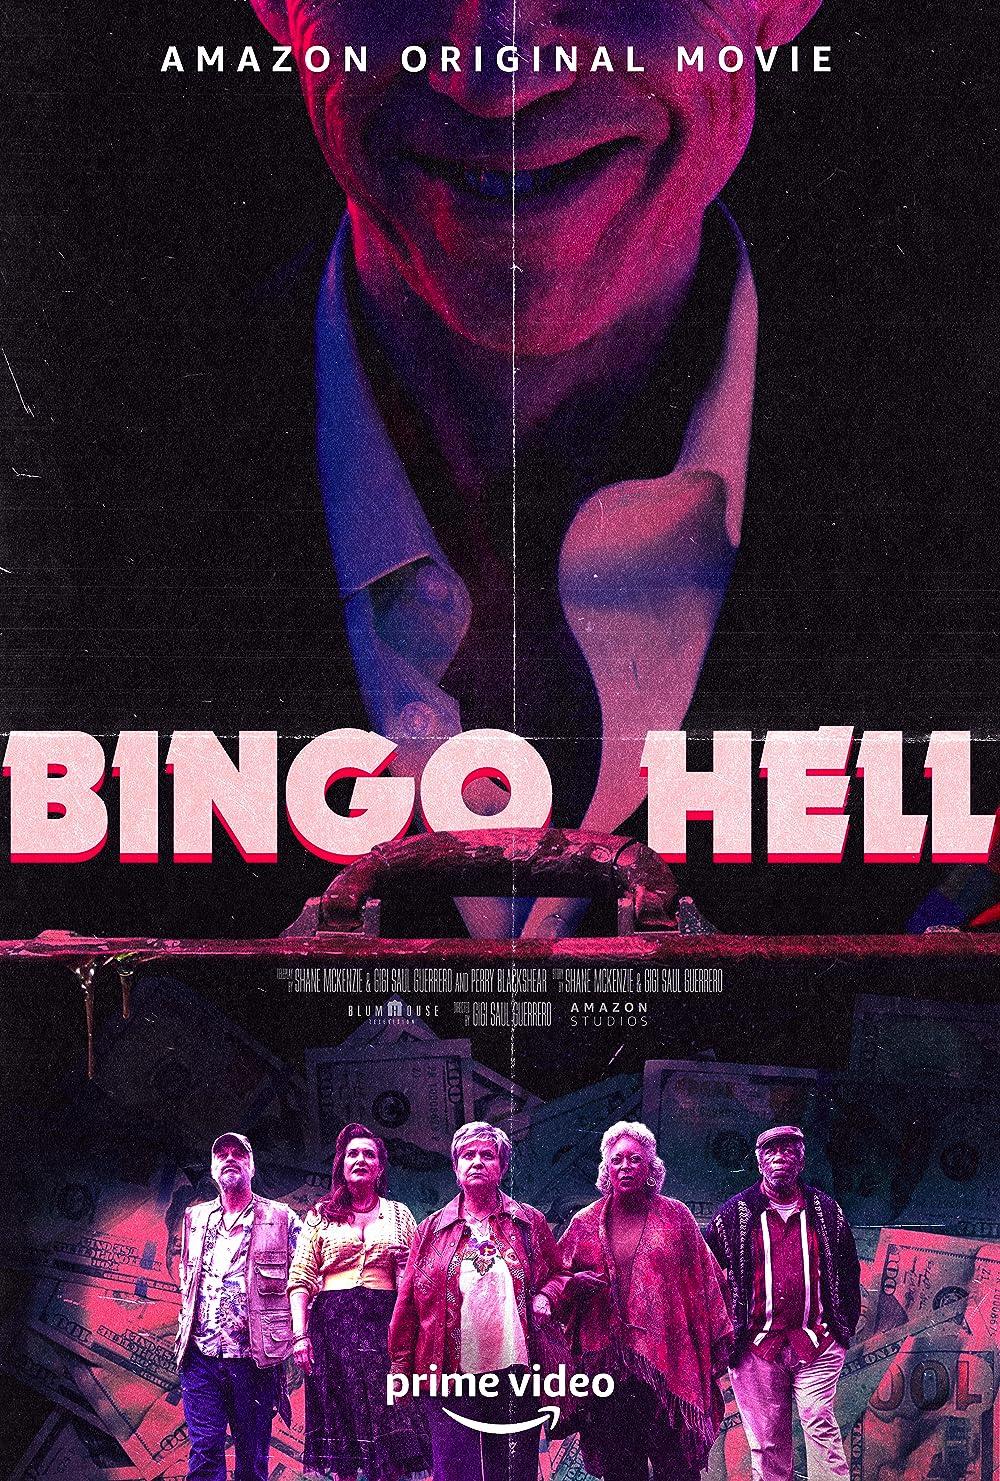 Bingo Hell (2021) Hindi (Voice Over) Dubbed+ English [Dual Audio] WebRip 720p [1XBET]